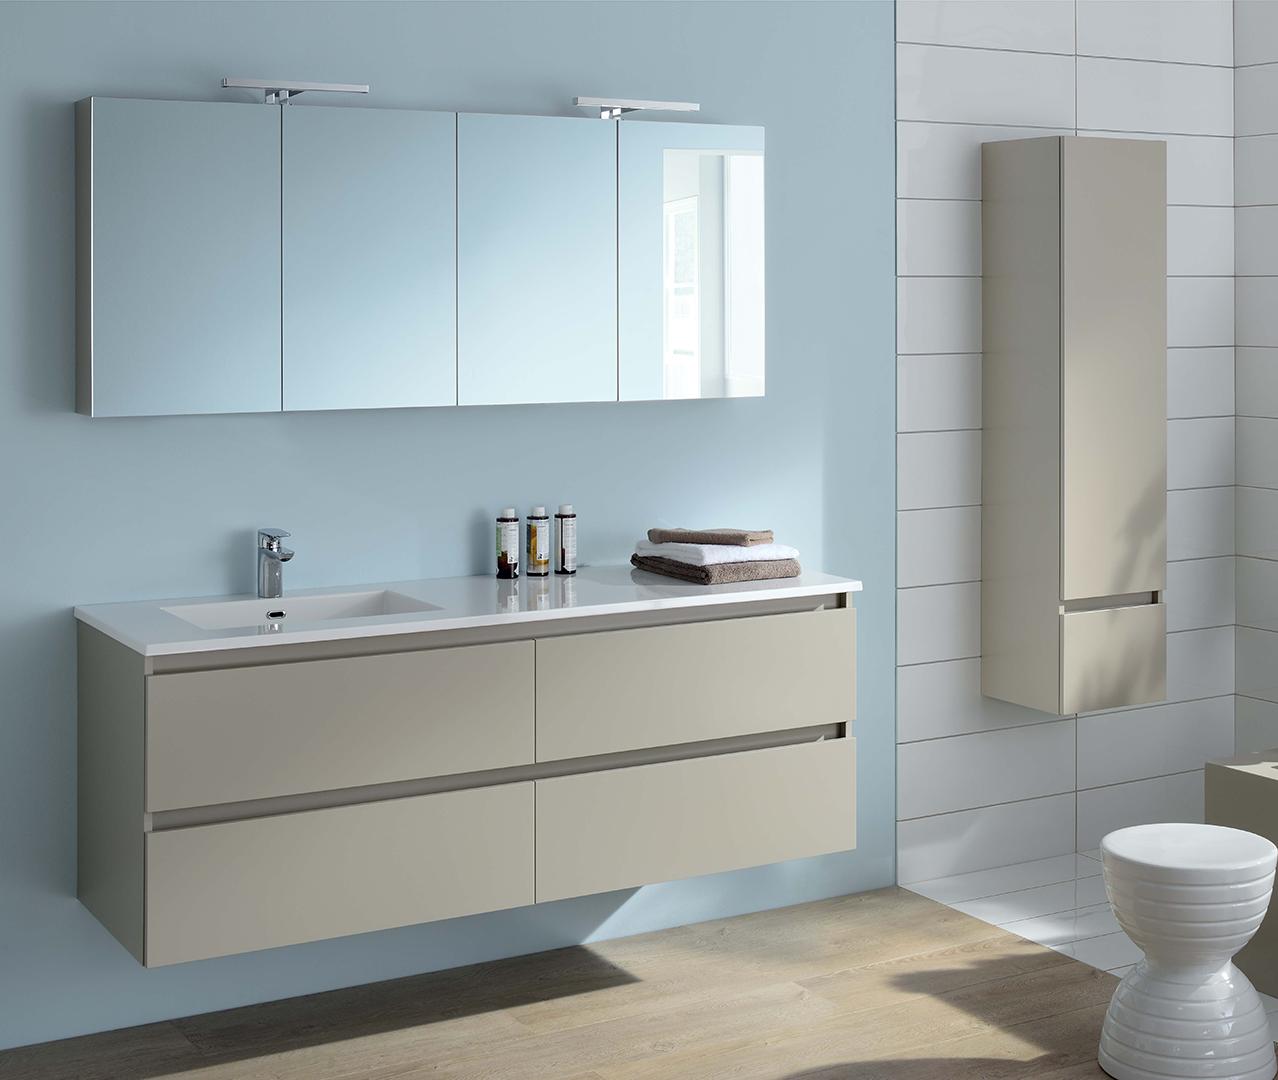 toutes nos gammes meuble salle de bains sanijura. Black Bedroom Furniture Sets. Home Design Ideas